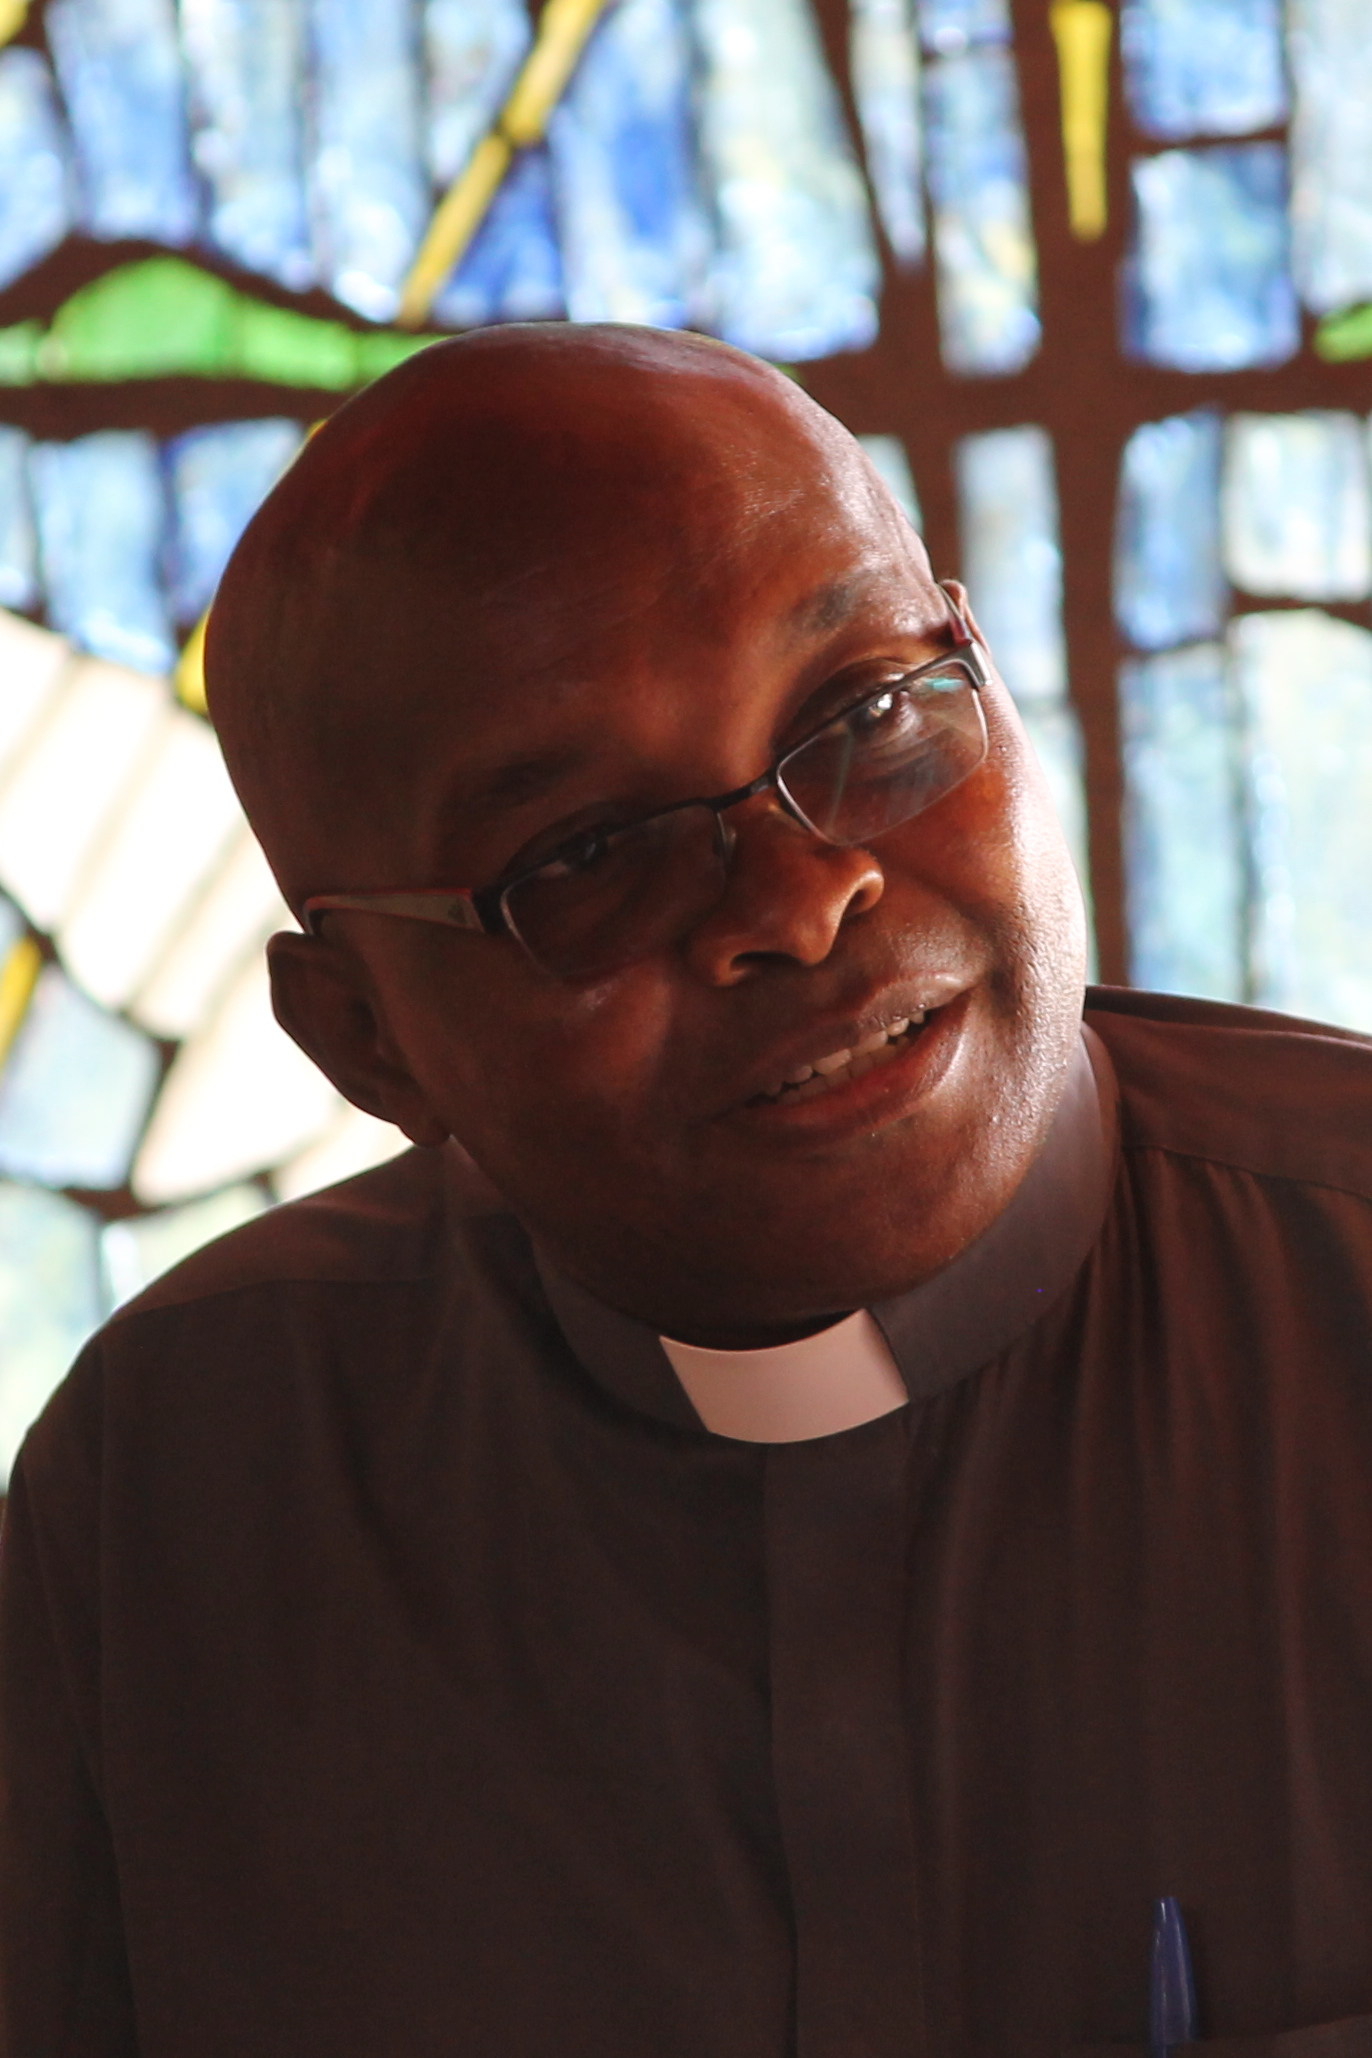 Grußwort von Rev. Luke Mwololo, KELC Generalsekretär